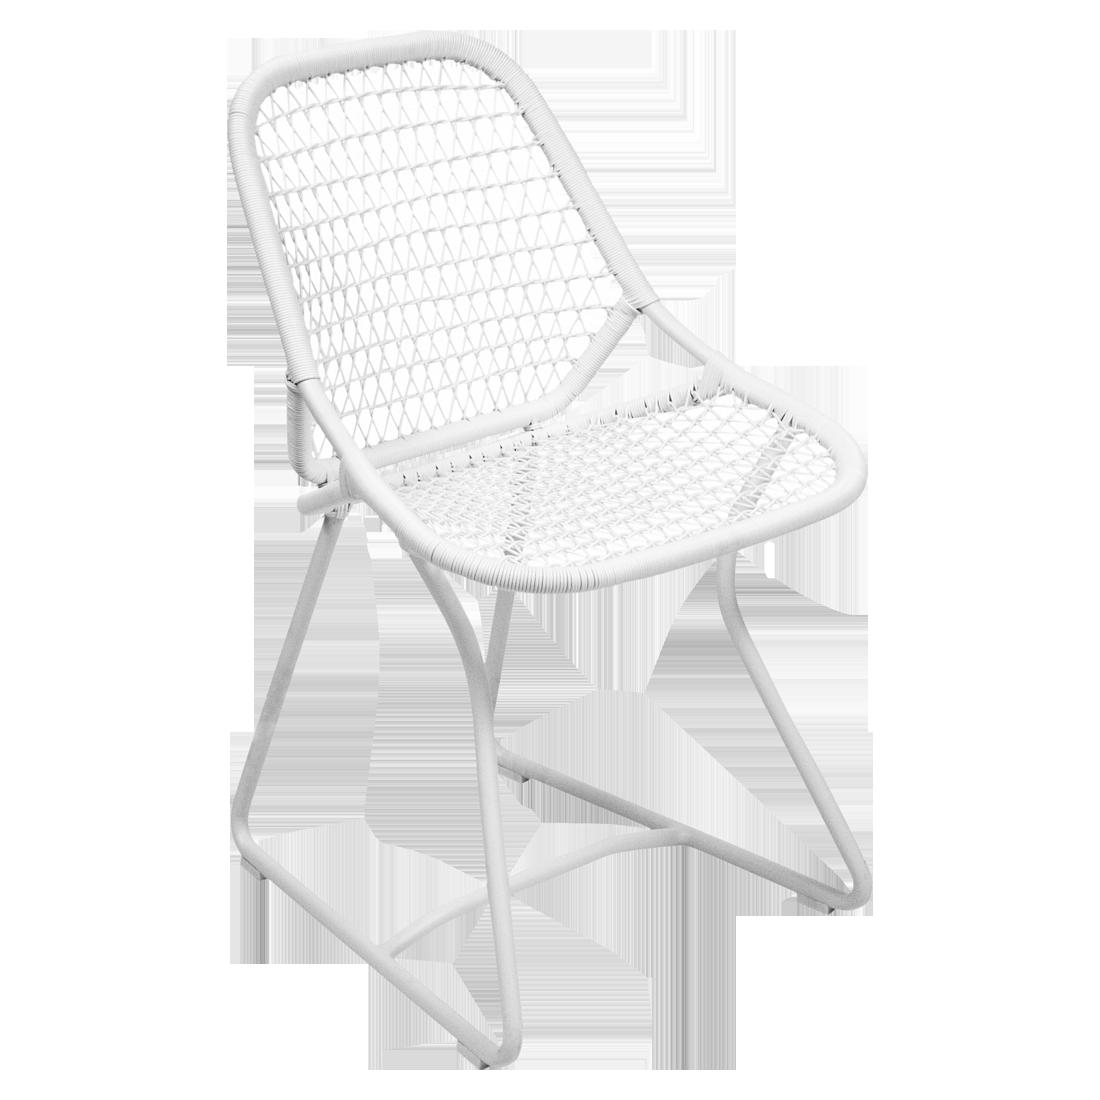 chaise de jardin design, chaise fermob, chaise blanche, chaise sixties